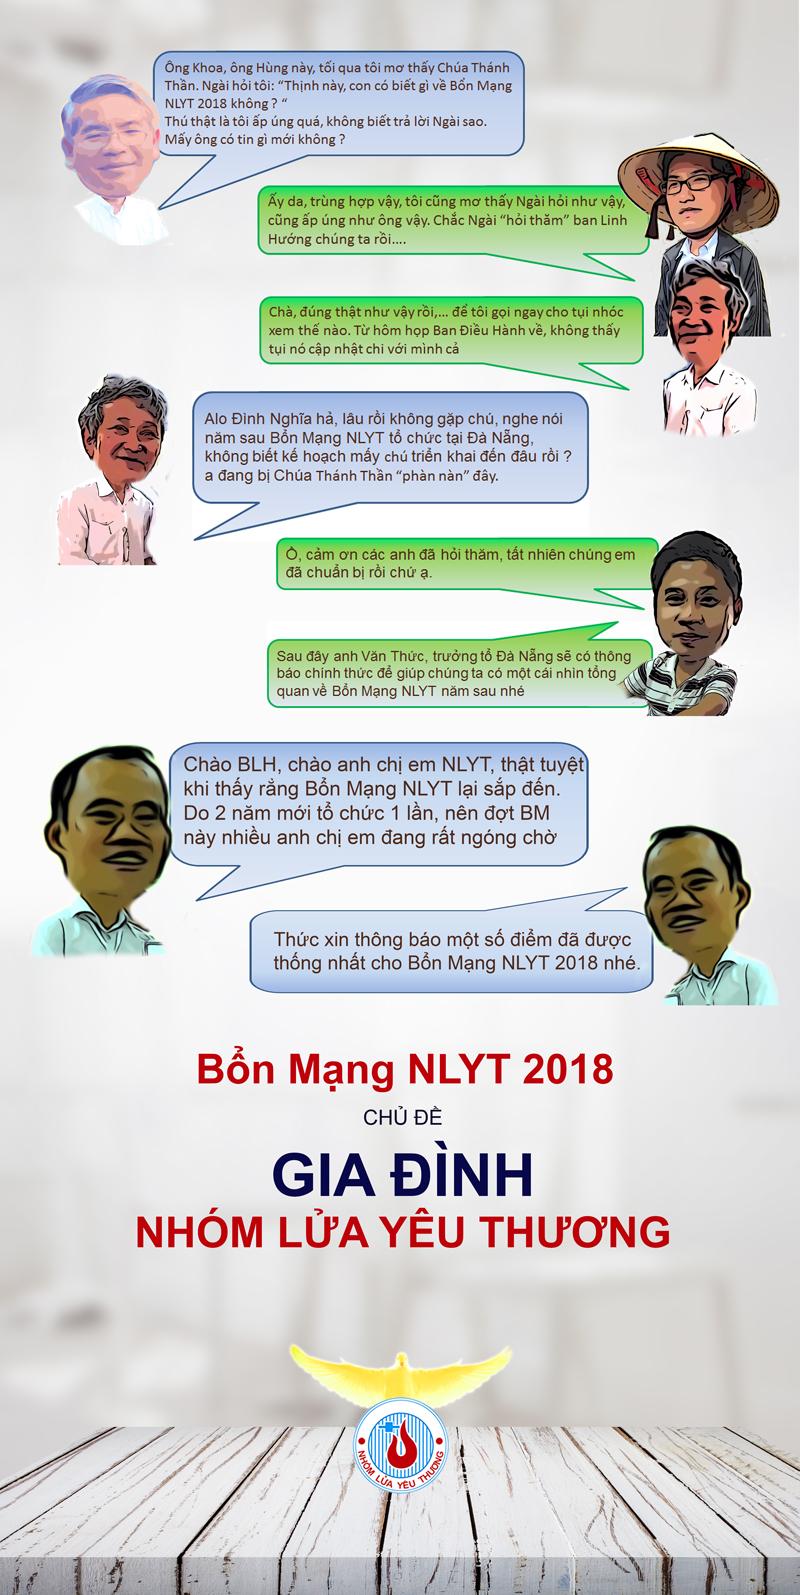 Bon Mang NLYT 2018 Da Nang